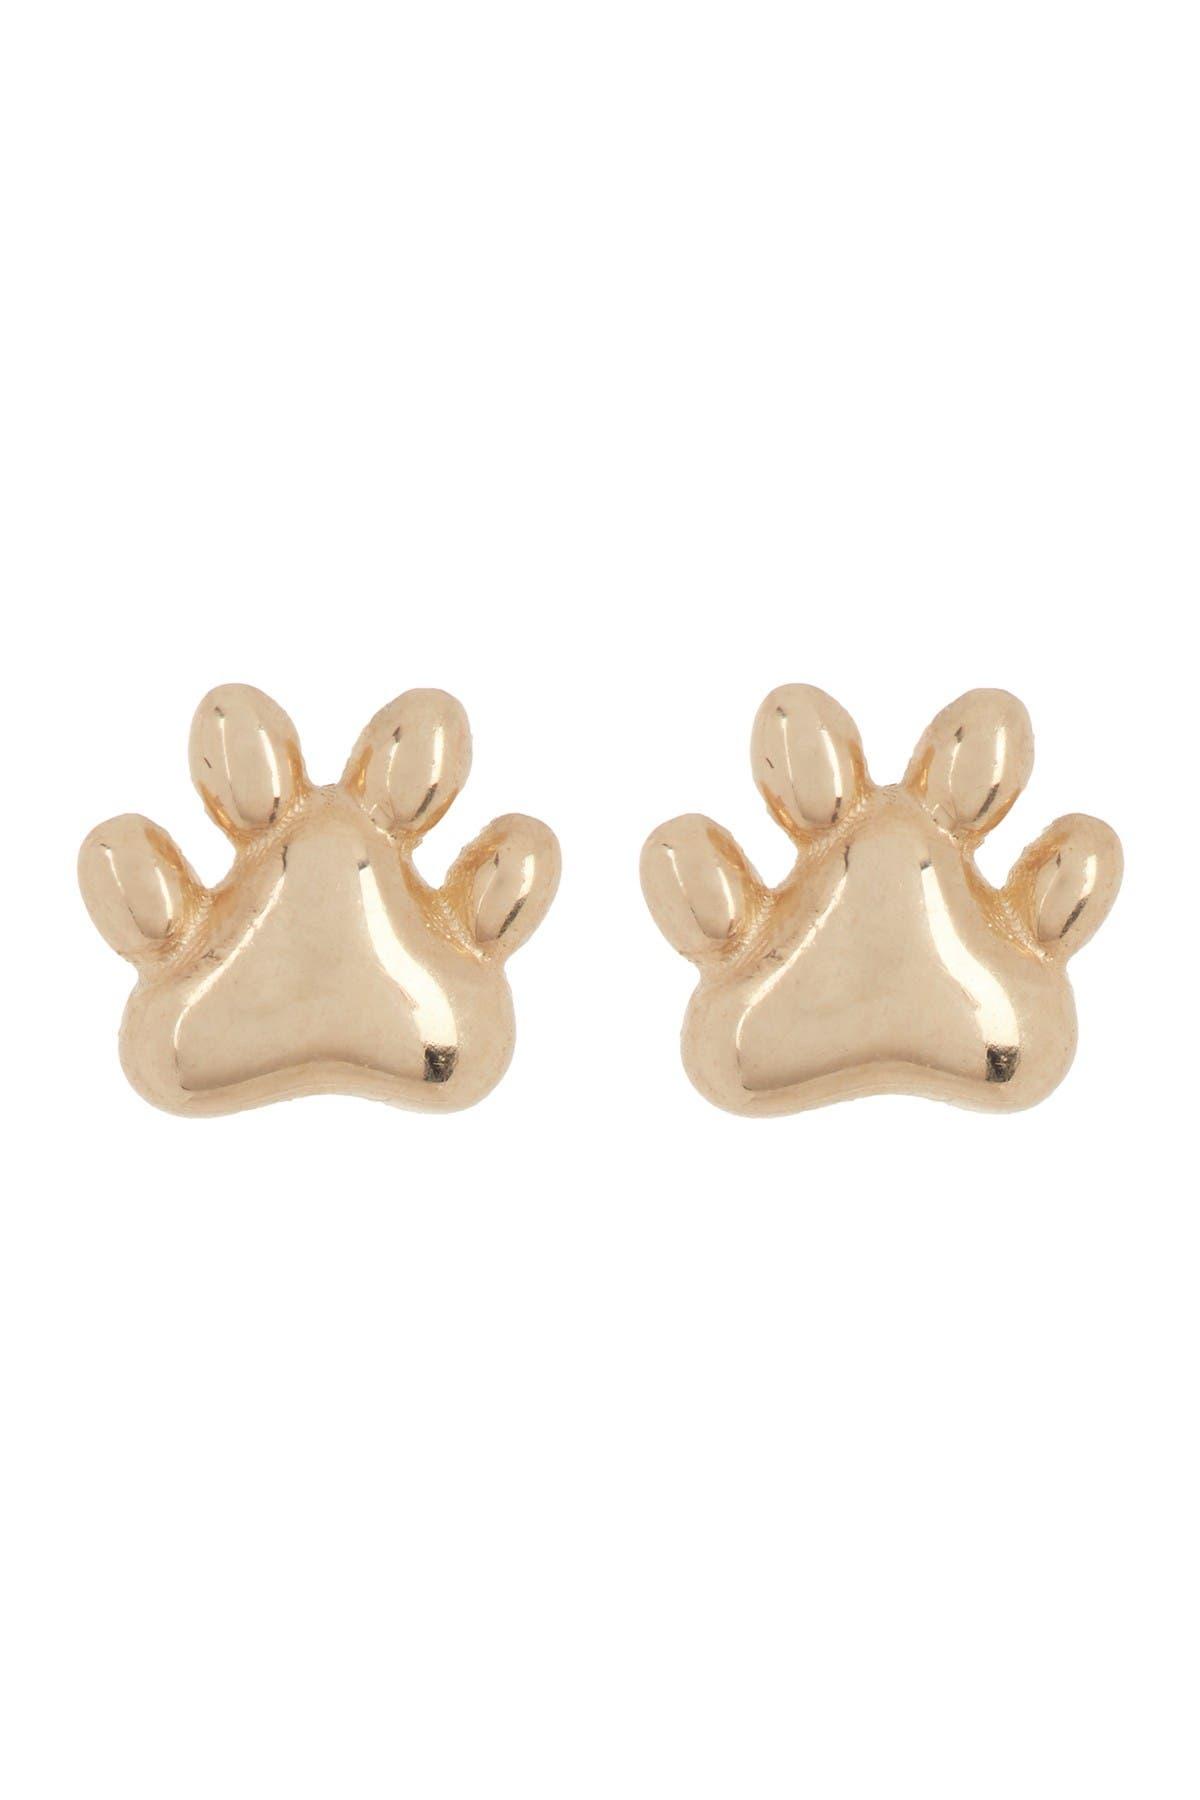 Image of Candela 14K Yellow Gold Paw Print Stud Earrings